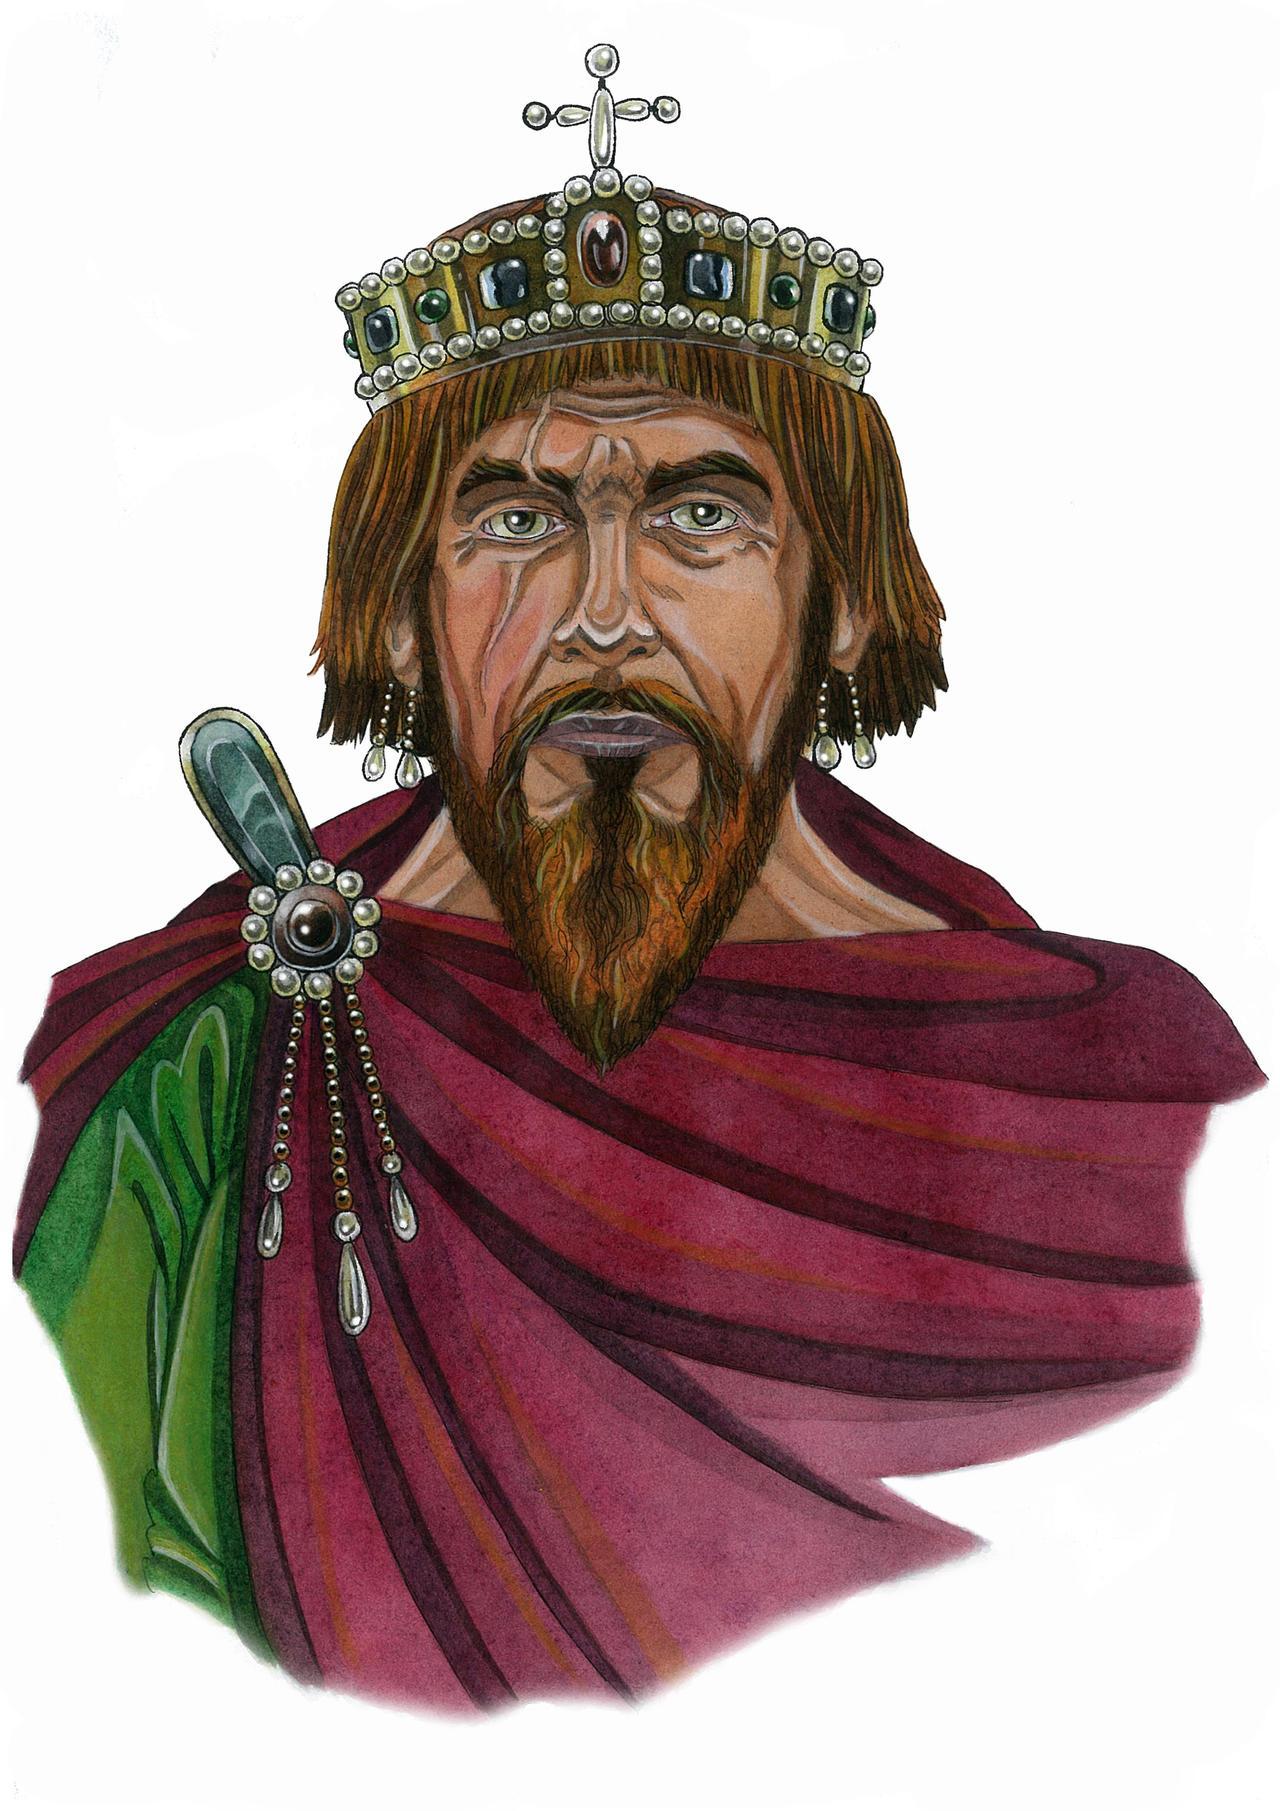 emperor_phocas_by_amelianvs_d9tbt7x-fullview